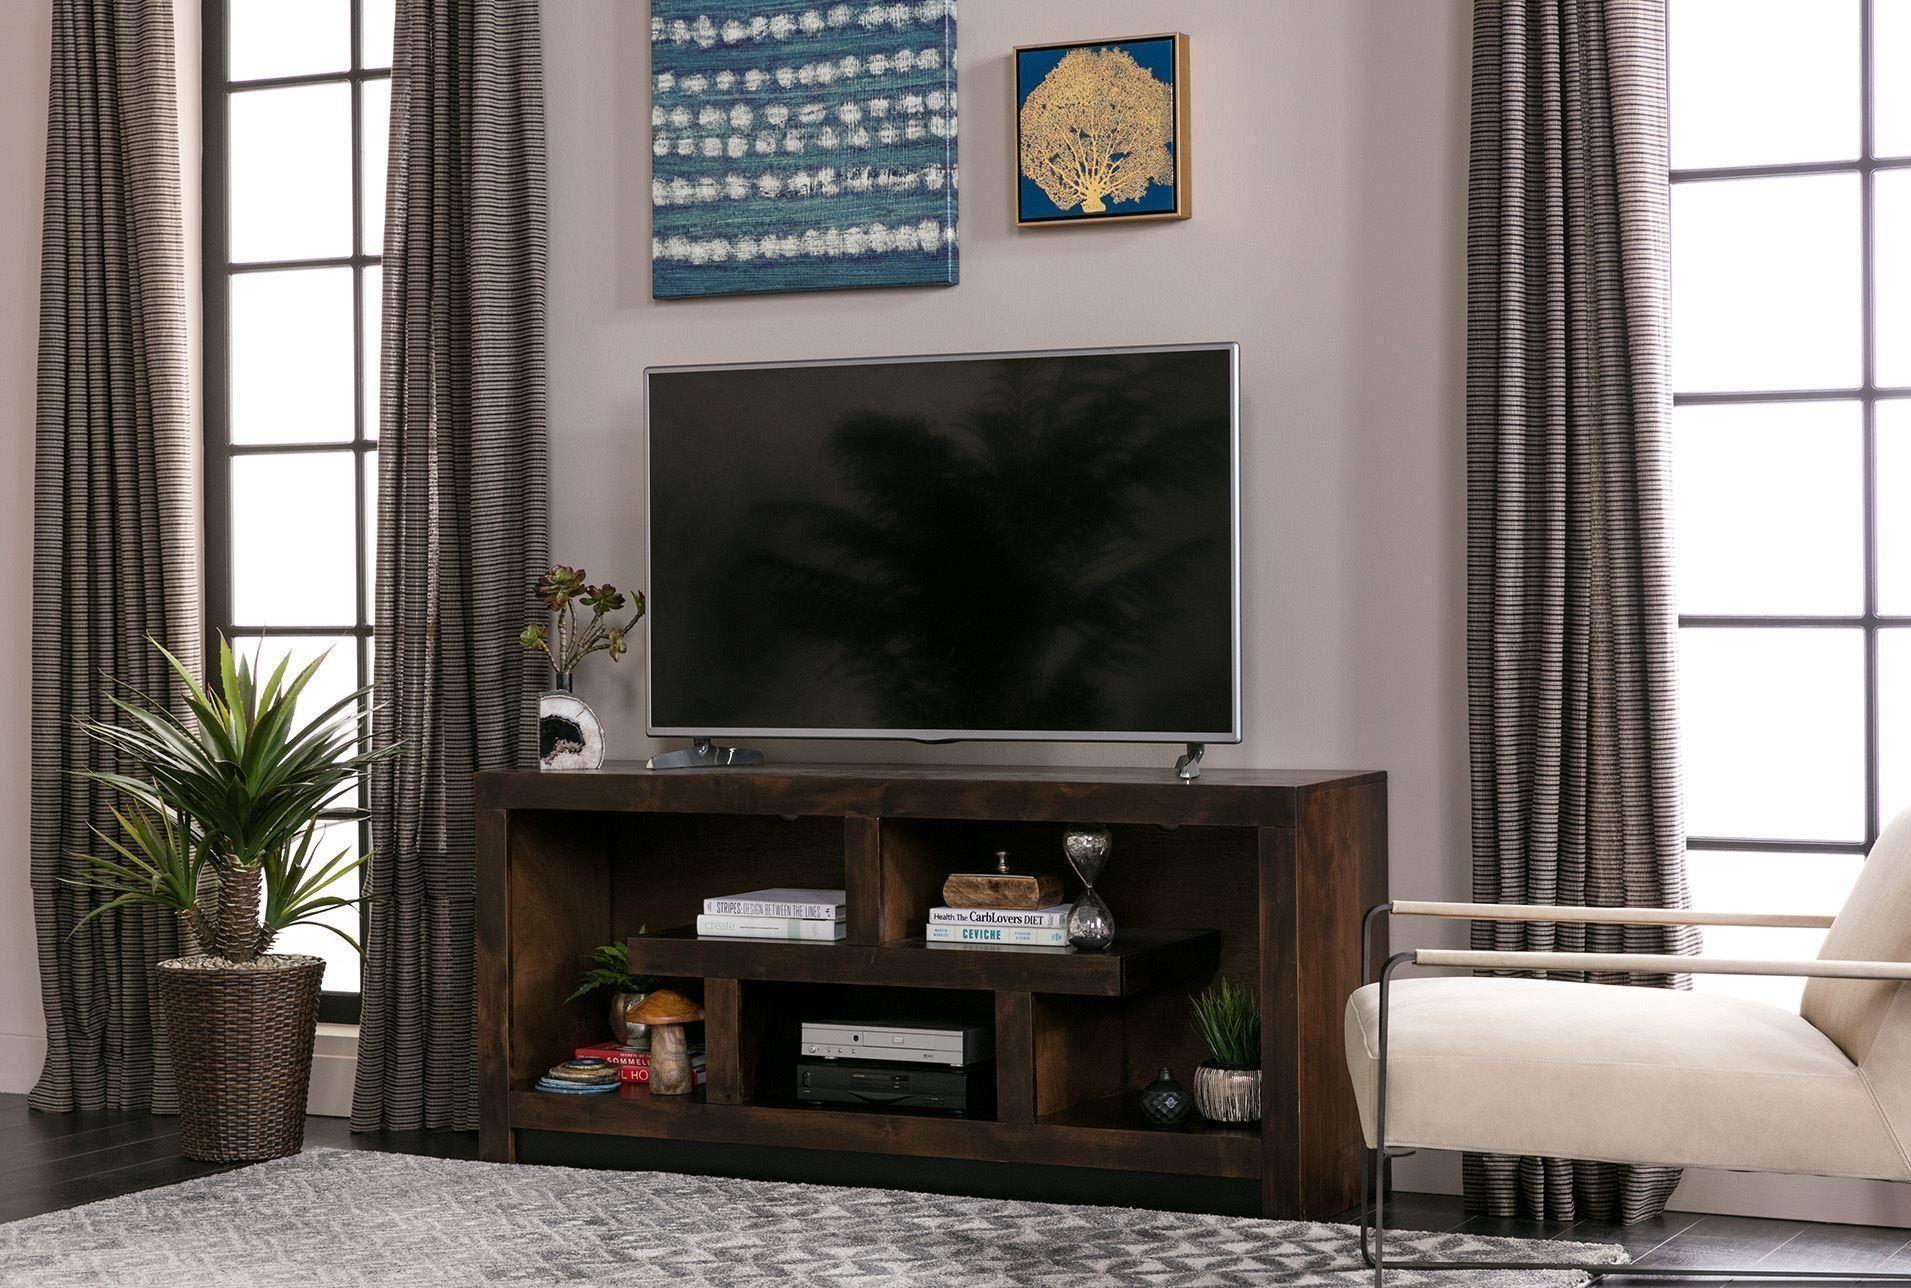 Walton 60 Inch Tv Stand | Rachelle's Redesign | Pinterest | 60 Inch Regarding Walton 60 Inch Tv Stands (View 2 of 30)